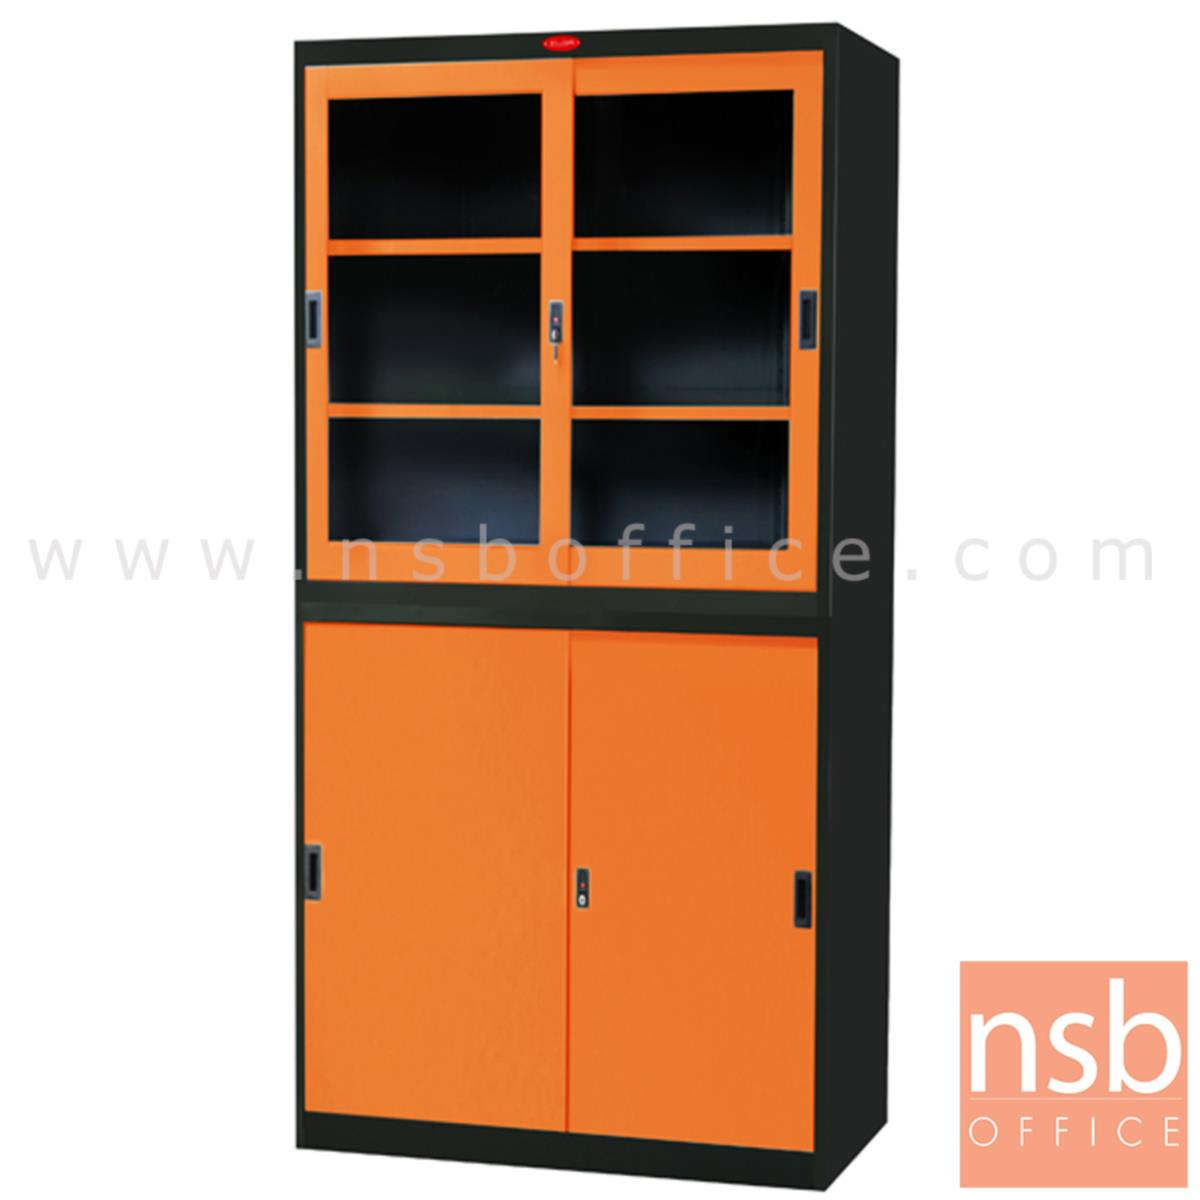 E04A054:ตู้เอกสารบานเลื่อน บนกระจกล่างทึบ รุ่น PPK-301 หน้าบานสีสันโครงตู้สีดำ